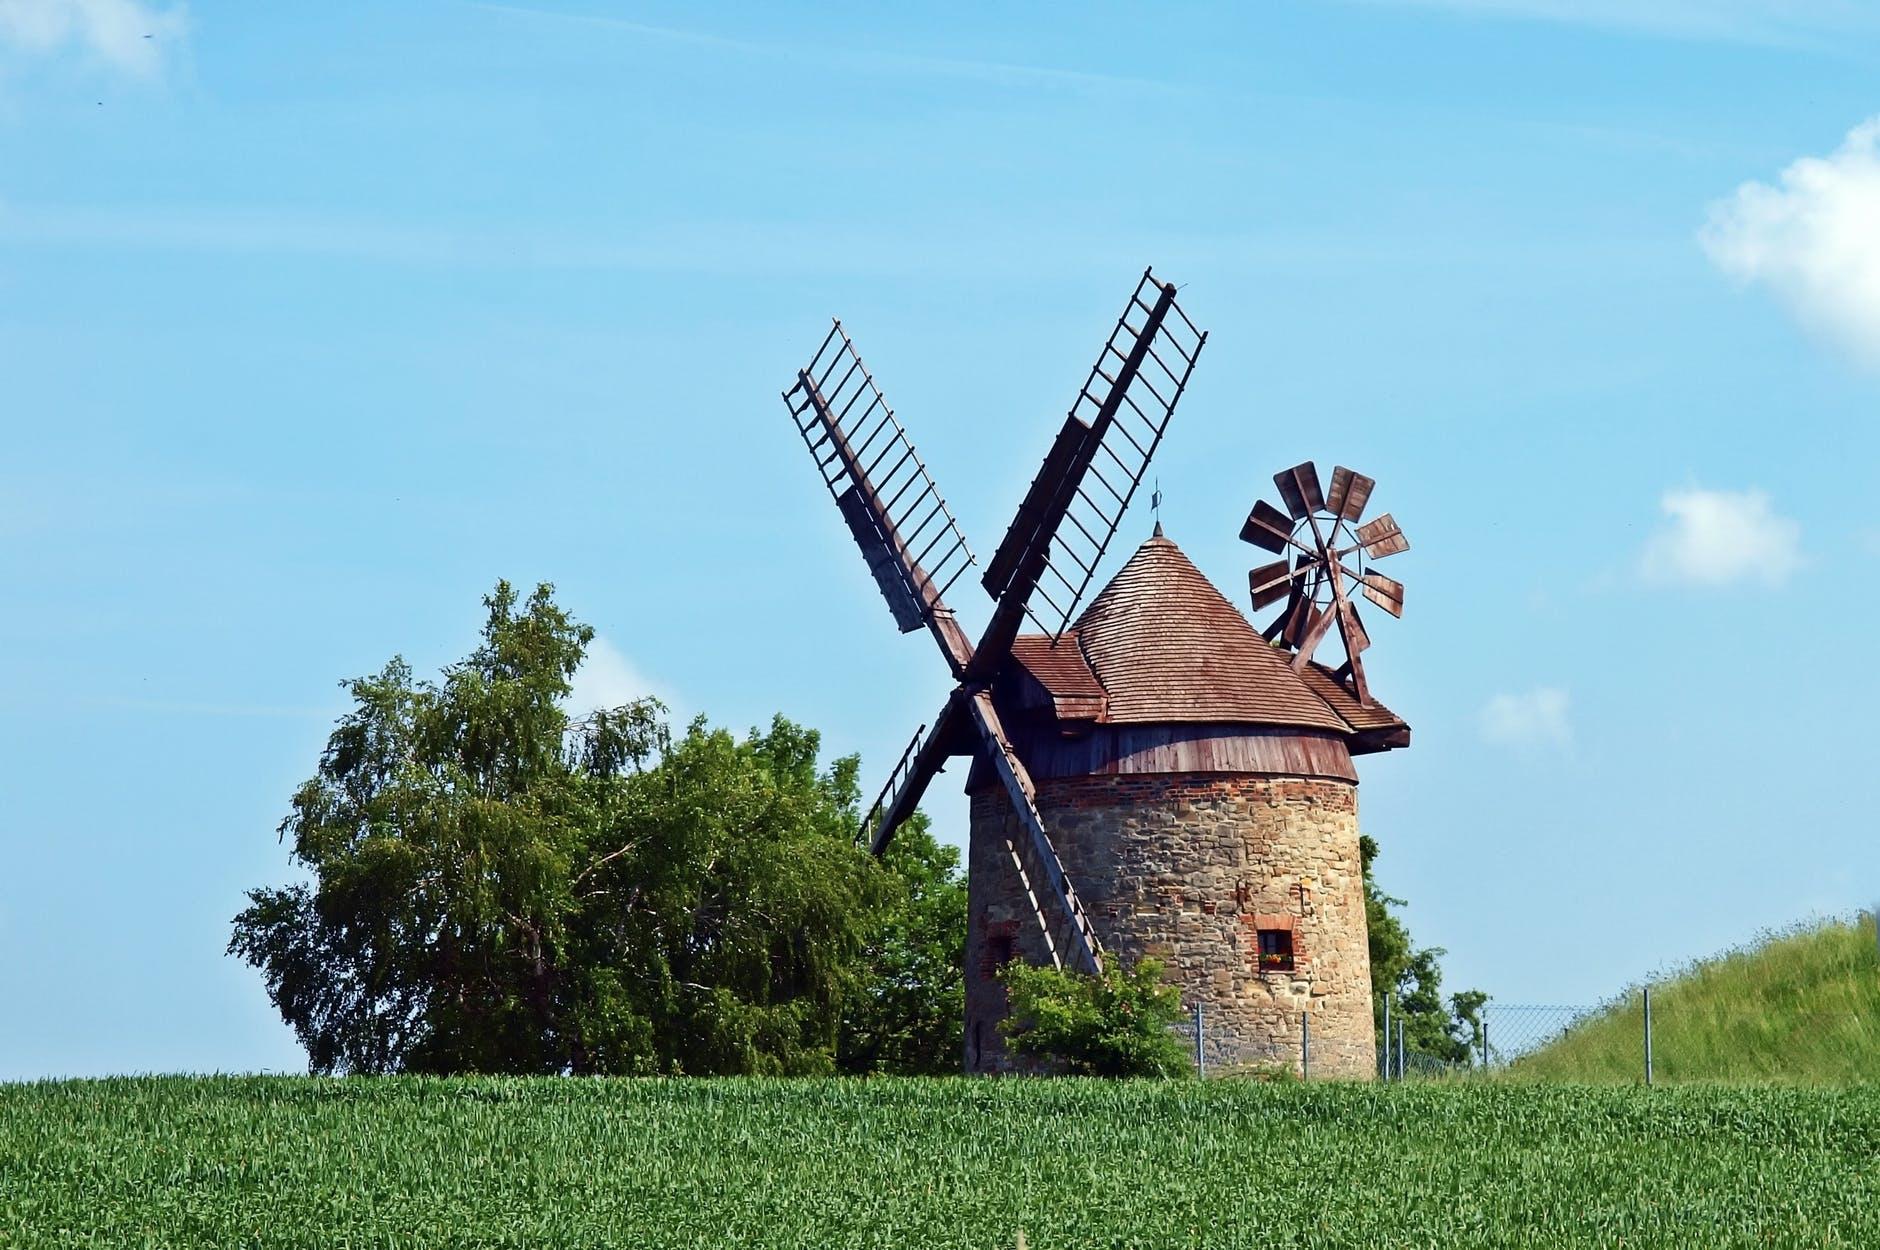 Windmill in a field